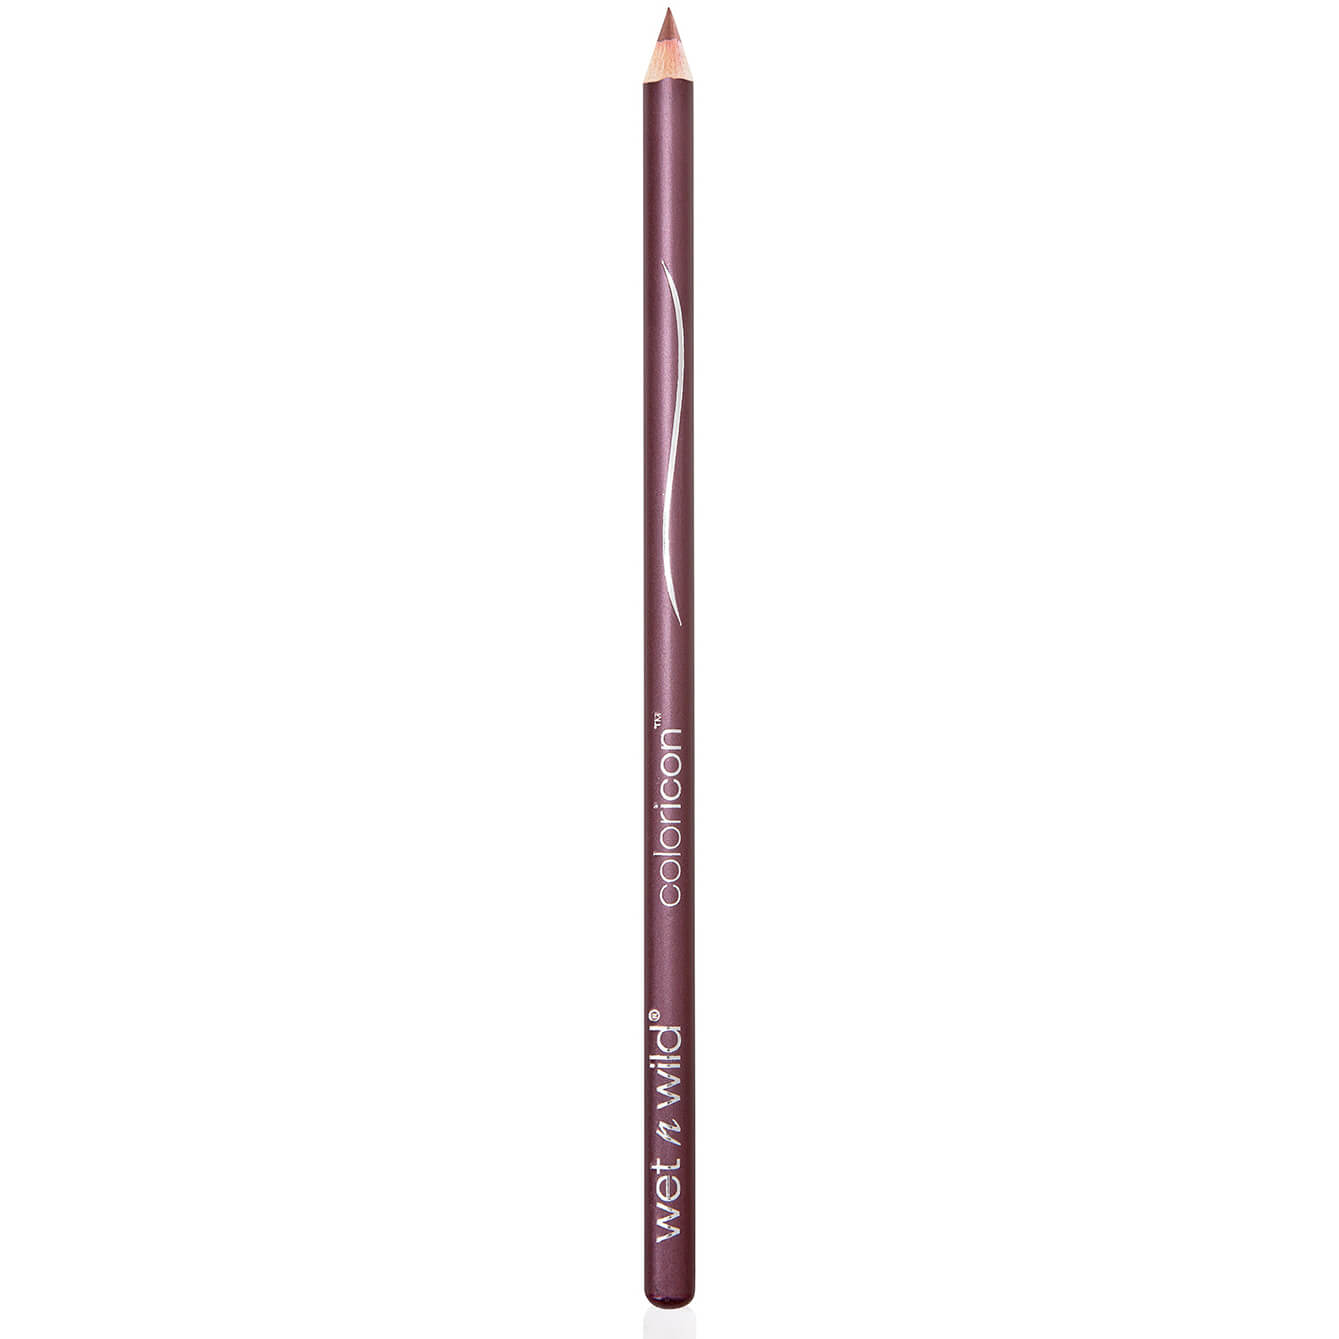 wet n wild coloricon Lipliner Pencil 1.4g (Various Shades) - Brandy Wine